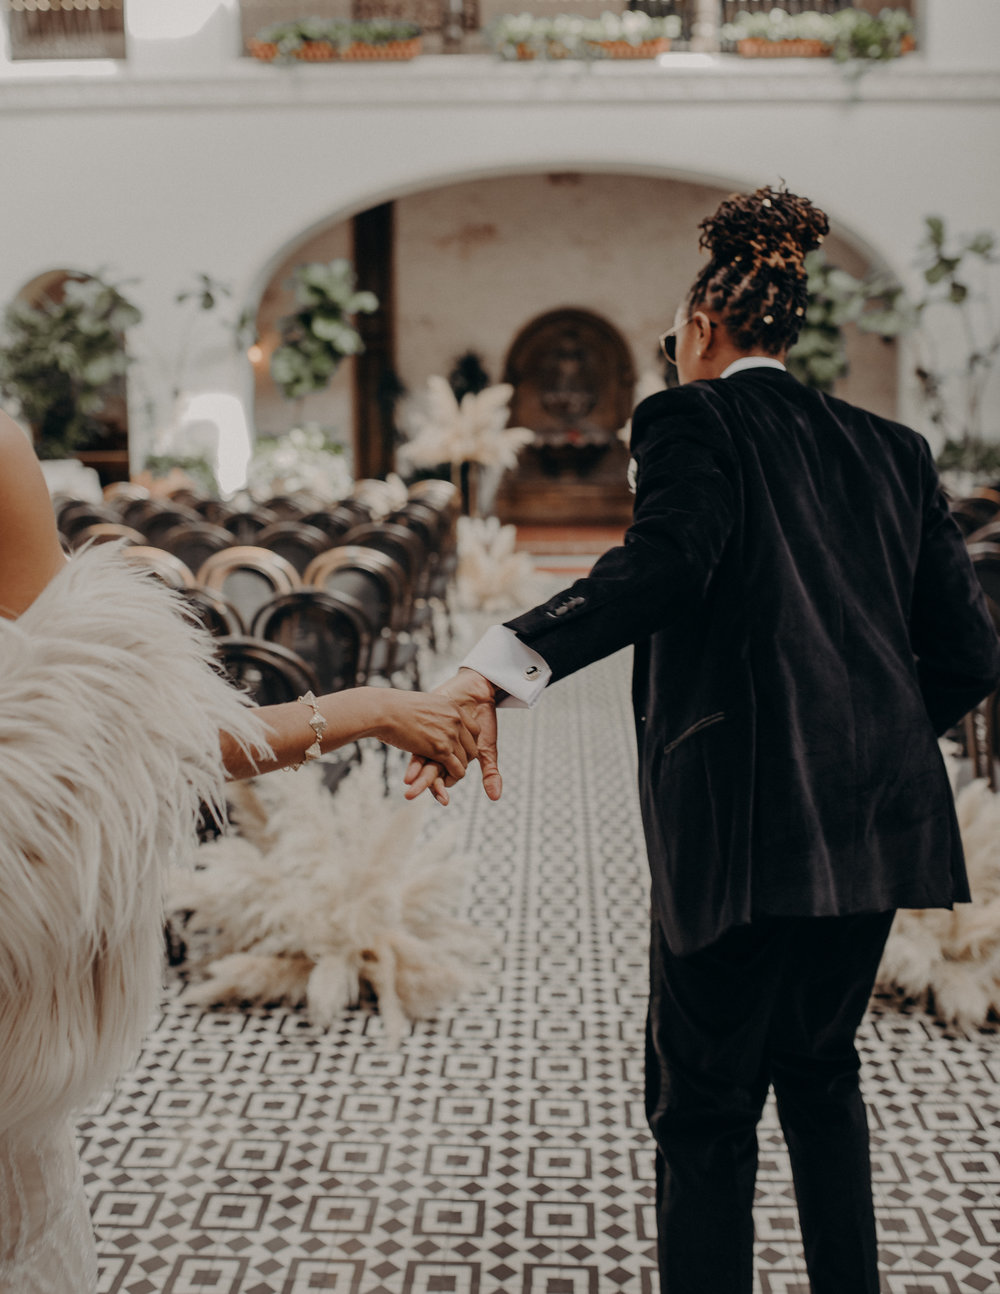 Wedding Photographer in Los Angeles - Ebell of Long Beach Wedding - LGBTQ weddings - lesbian wedding - IsaiahAndTaylor.com-060.jpg